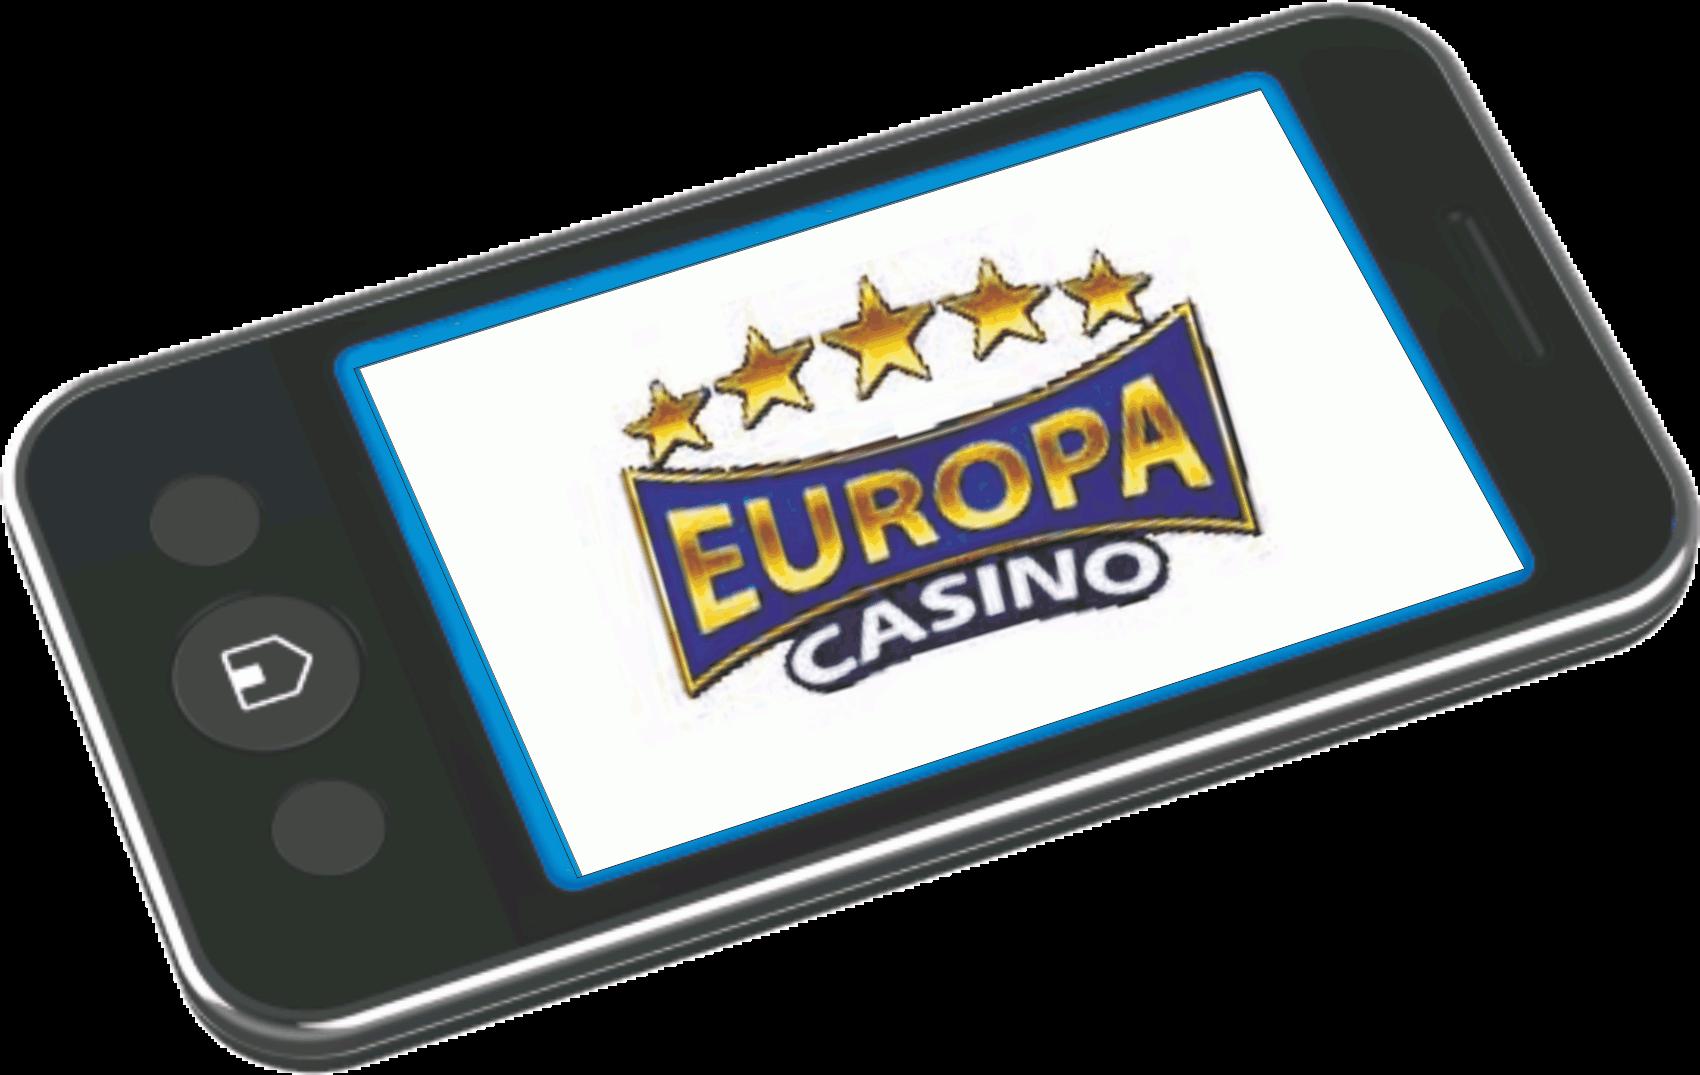 Europa Casino app - 35015